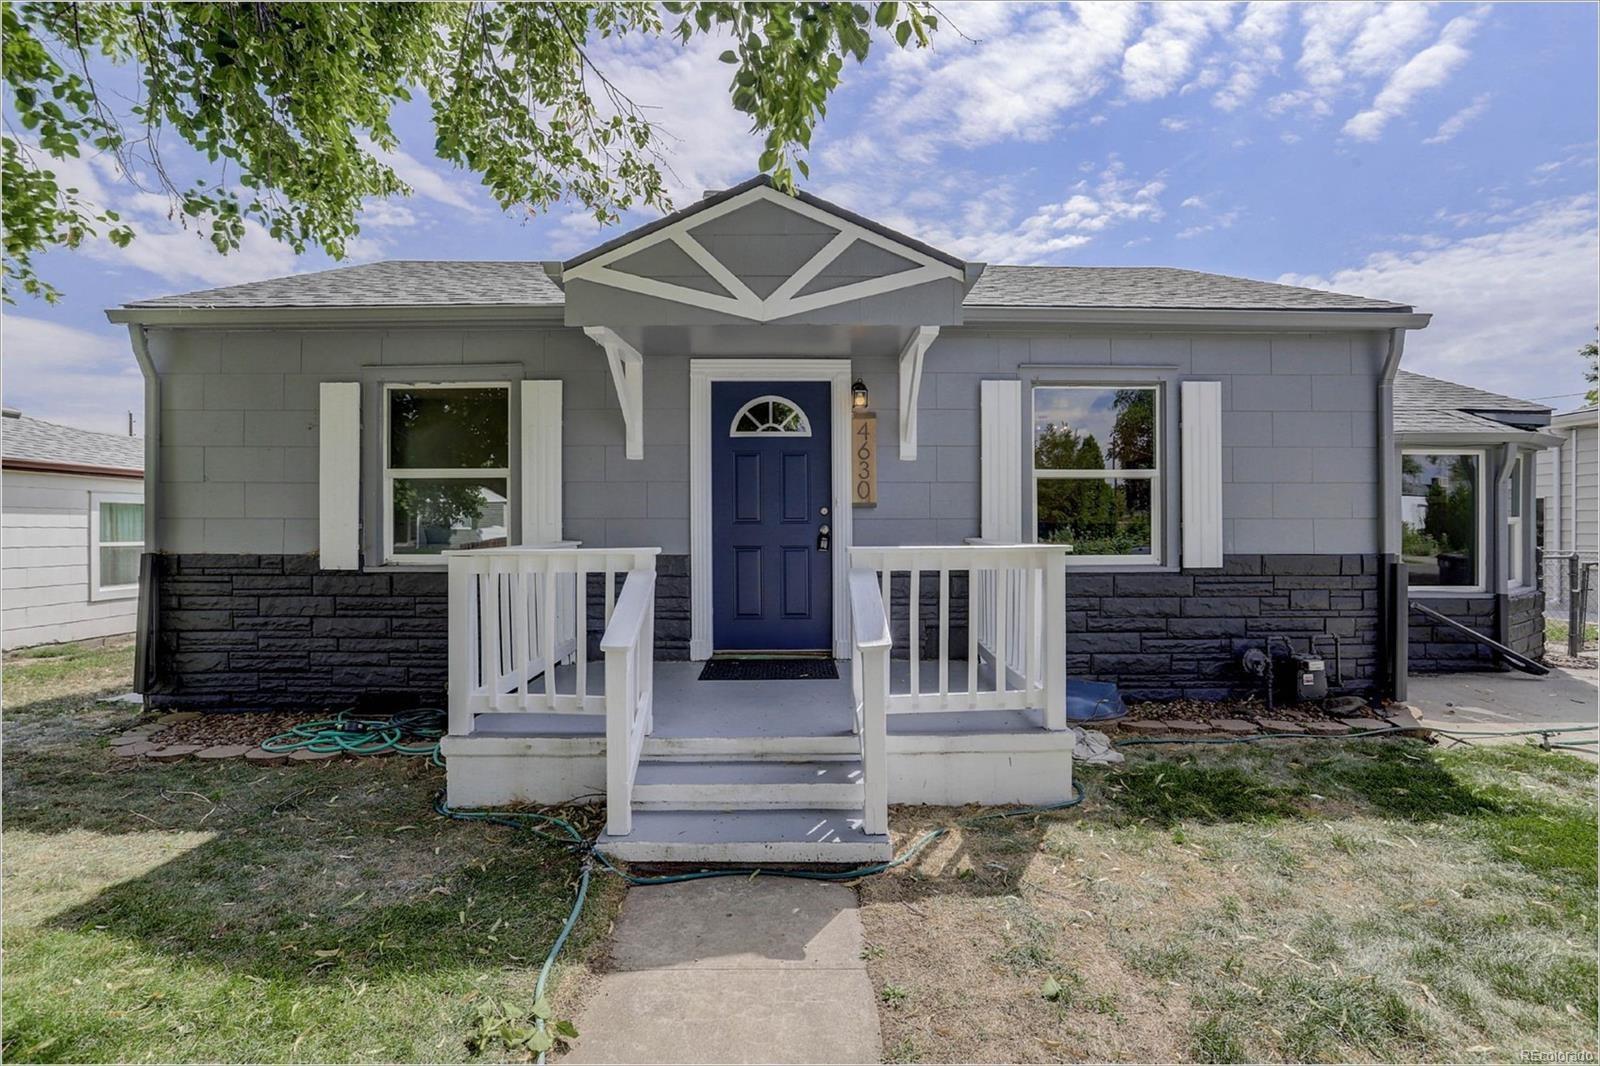 MLS# 6355540 - 2 - 4630 Wyandot Street, Denver, CO 80211